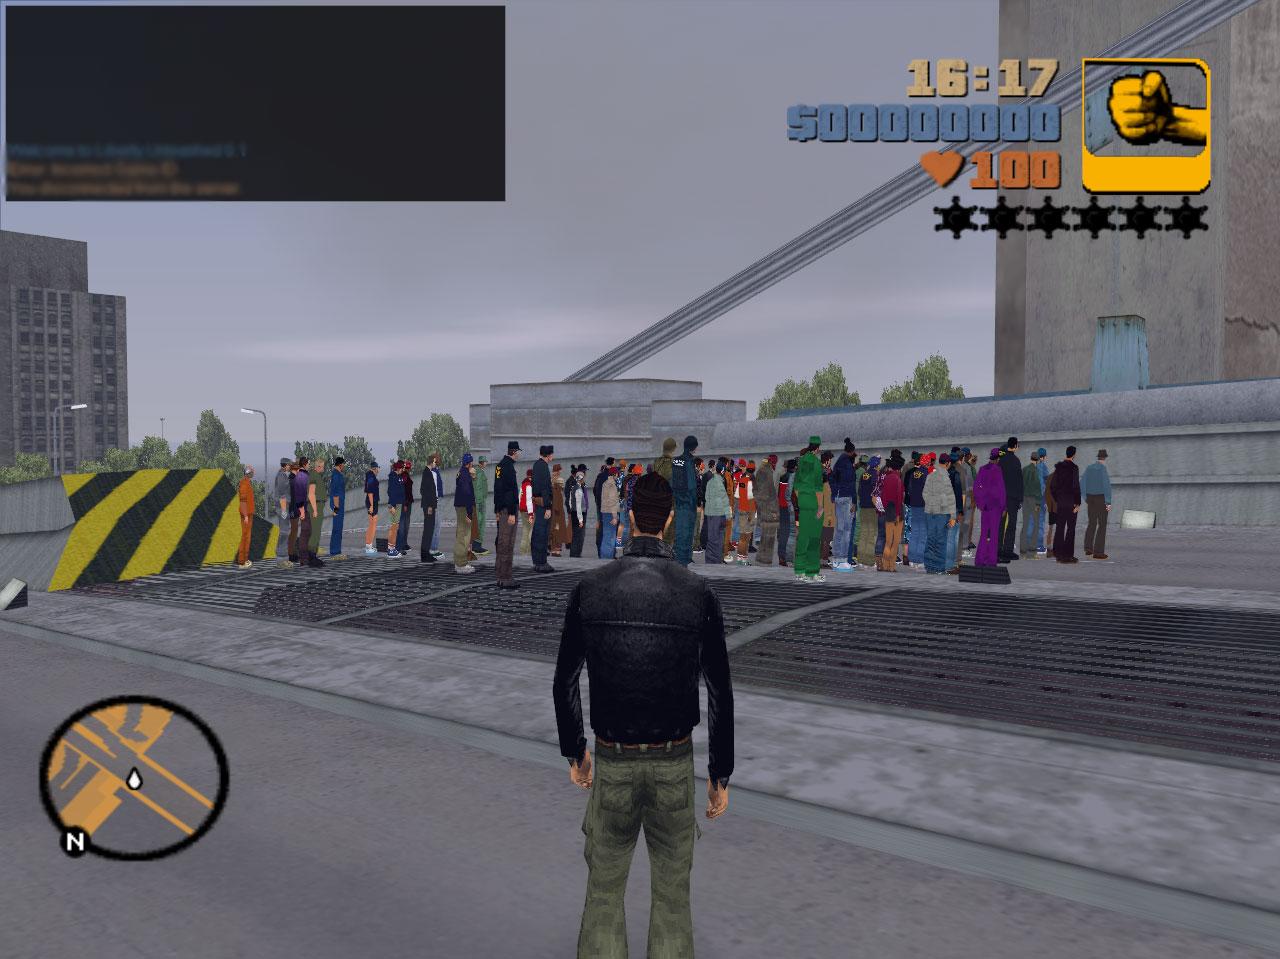 grand theft auto 3 multiplayer